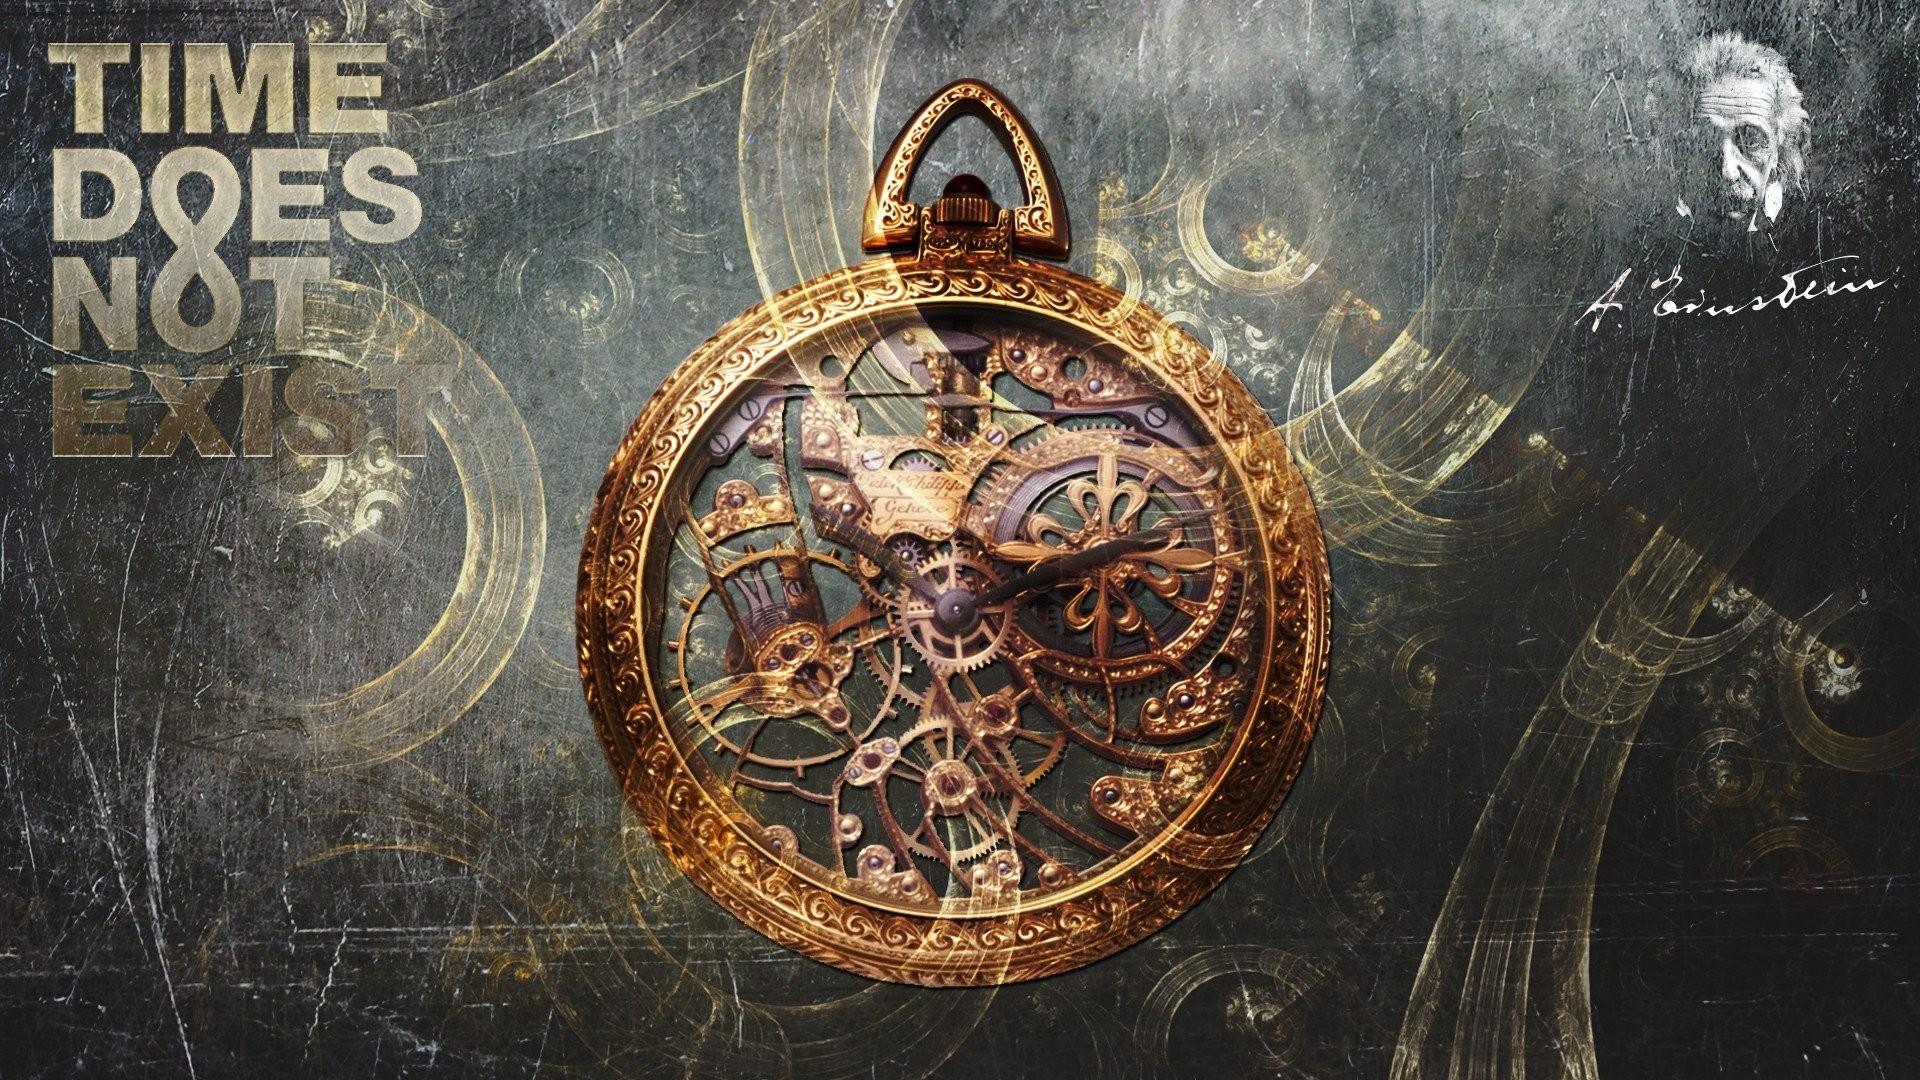 artwork, Fantasy Art, Time, Clocks, Clockwork, Pocketwatches, Albert  Einstein Wallpapers HD / Desktop and Mobile Backgrounds